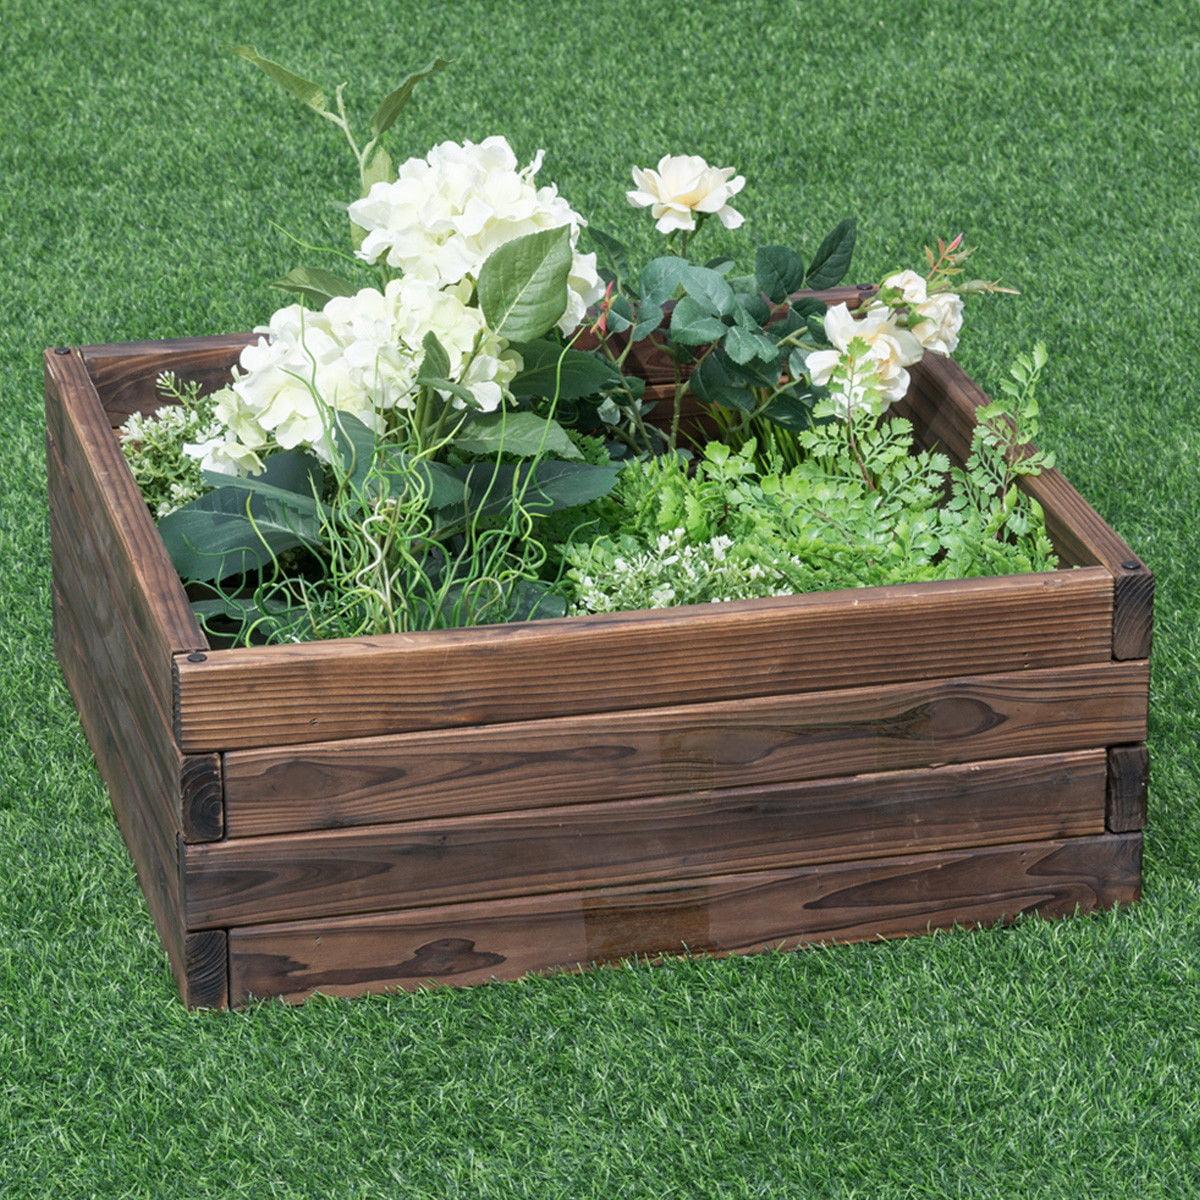 Costway Square Raised Garden Bed Flower Vegetables Seeds